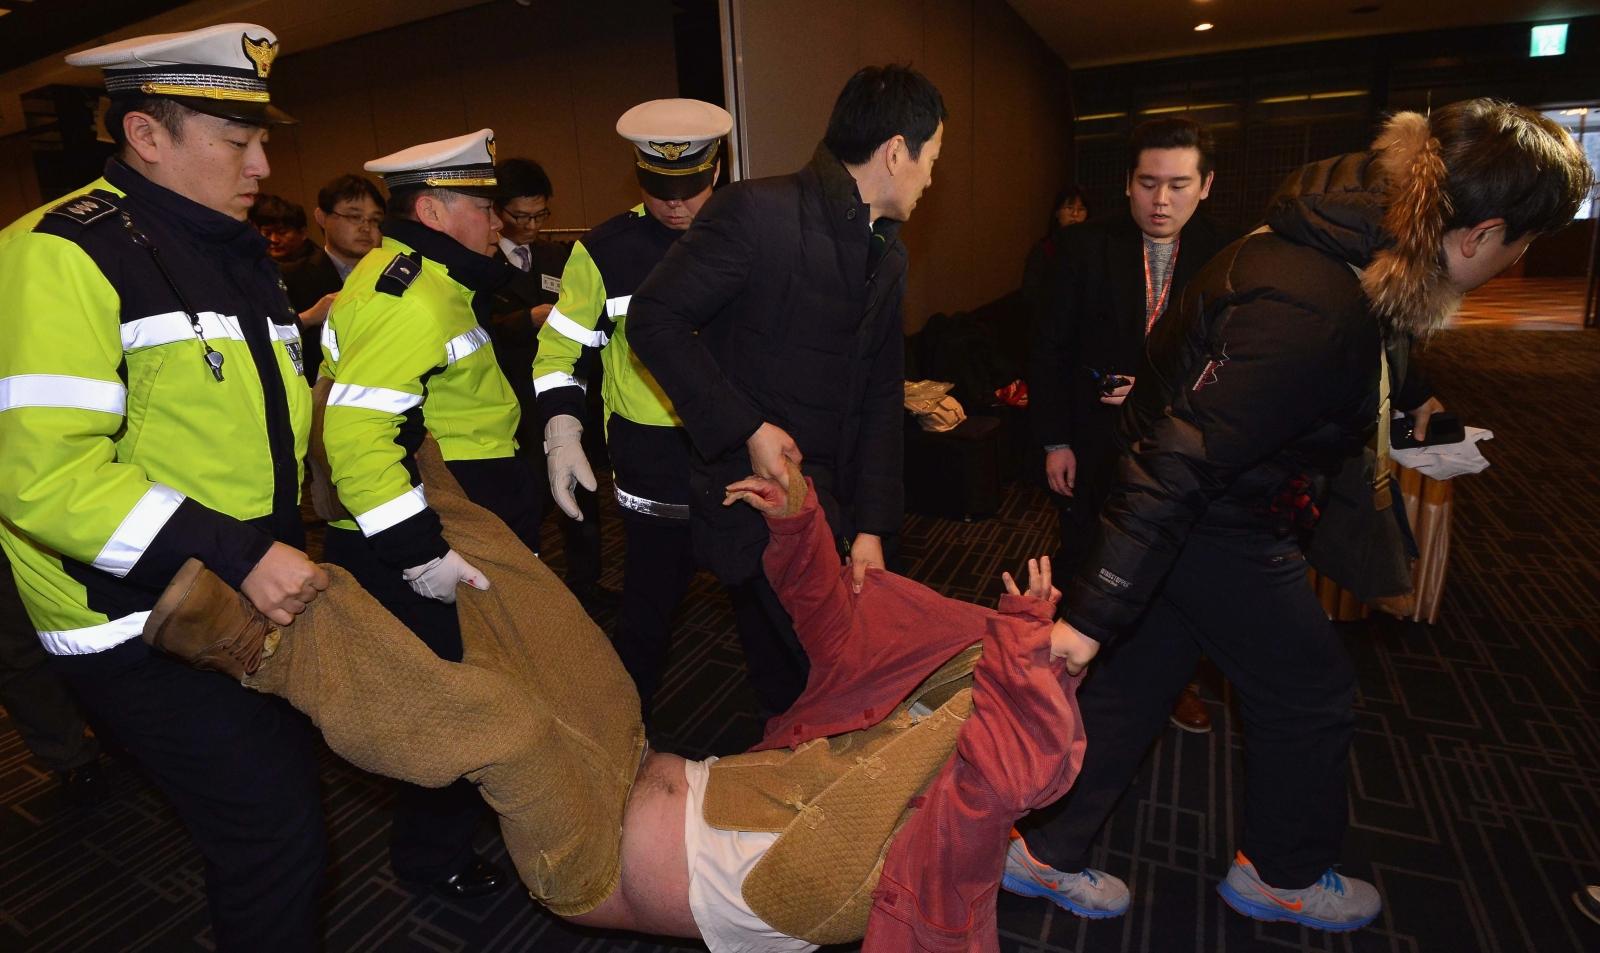 US ambassador Lippert attacker Kim ki-jong